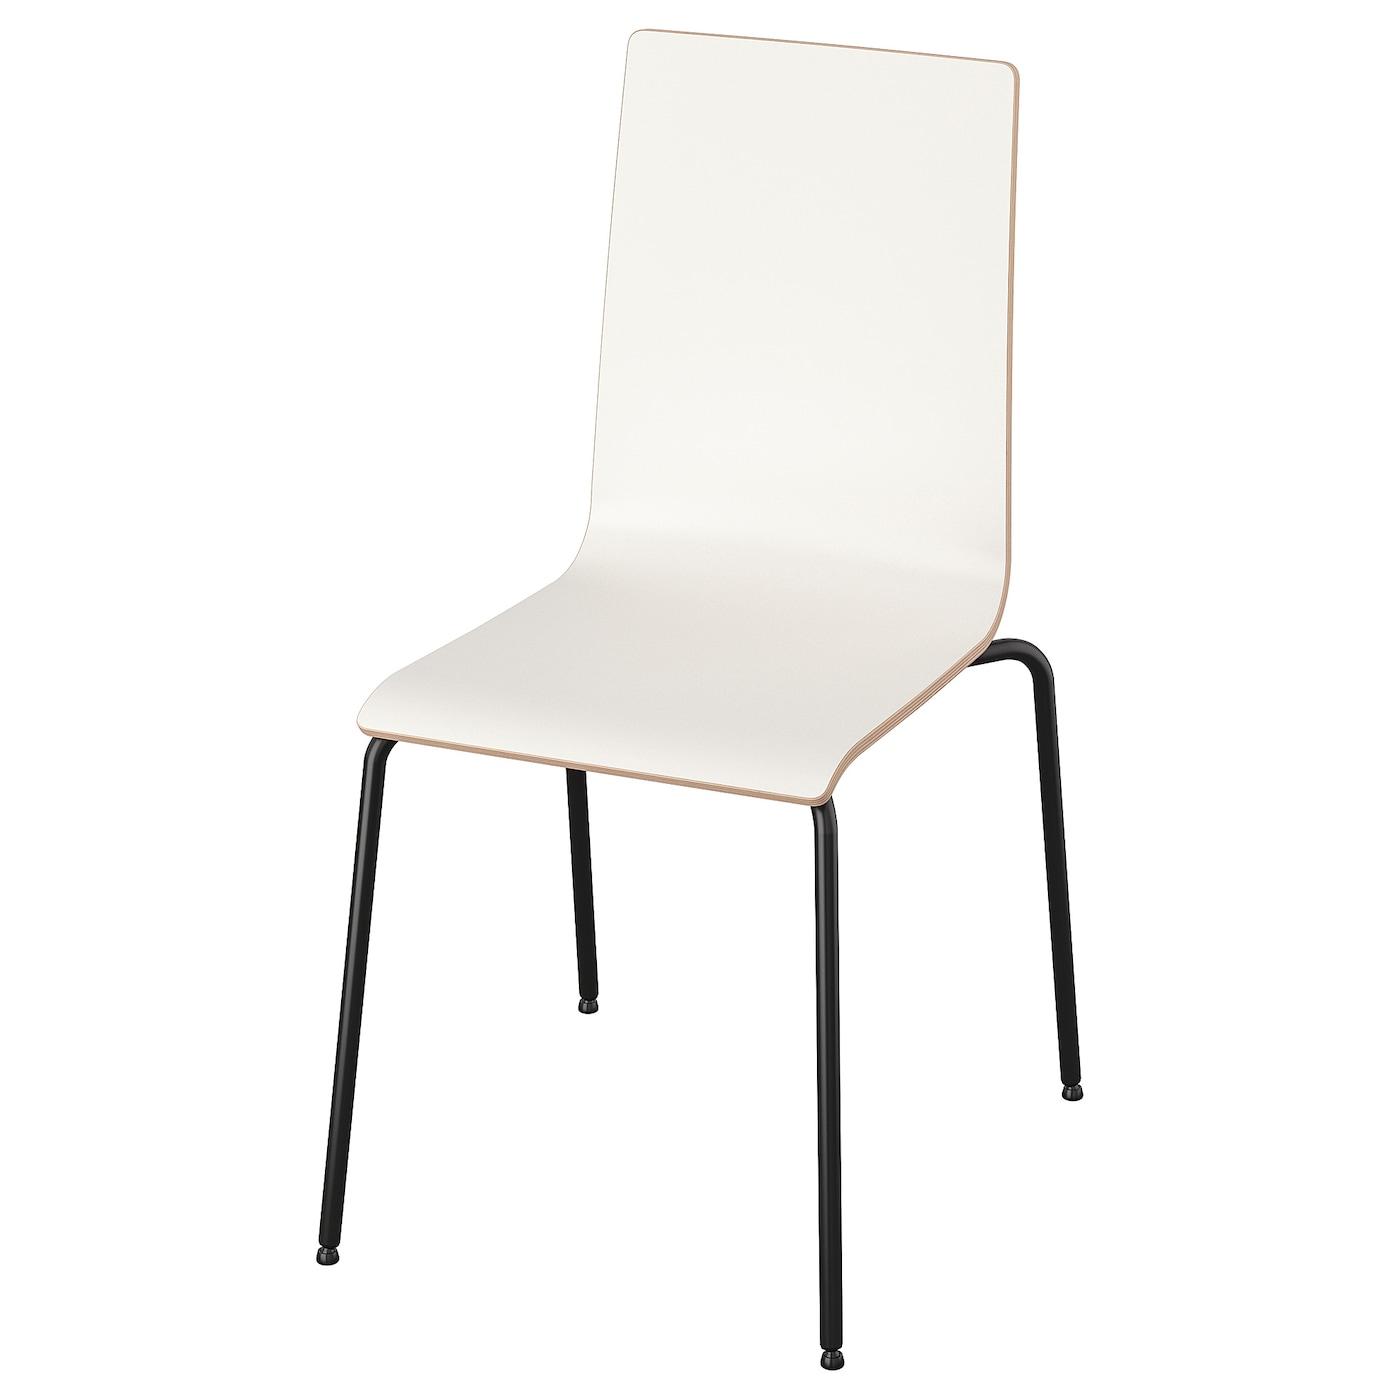 MARTIN Eetkamerstoel, zwart, wit IKEA